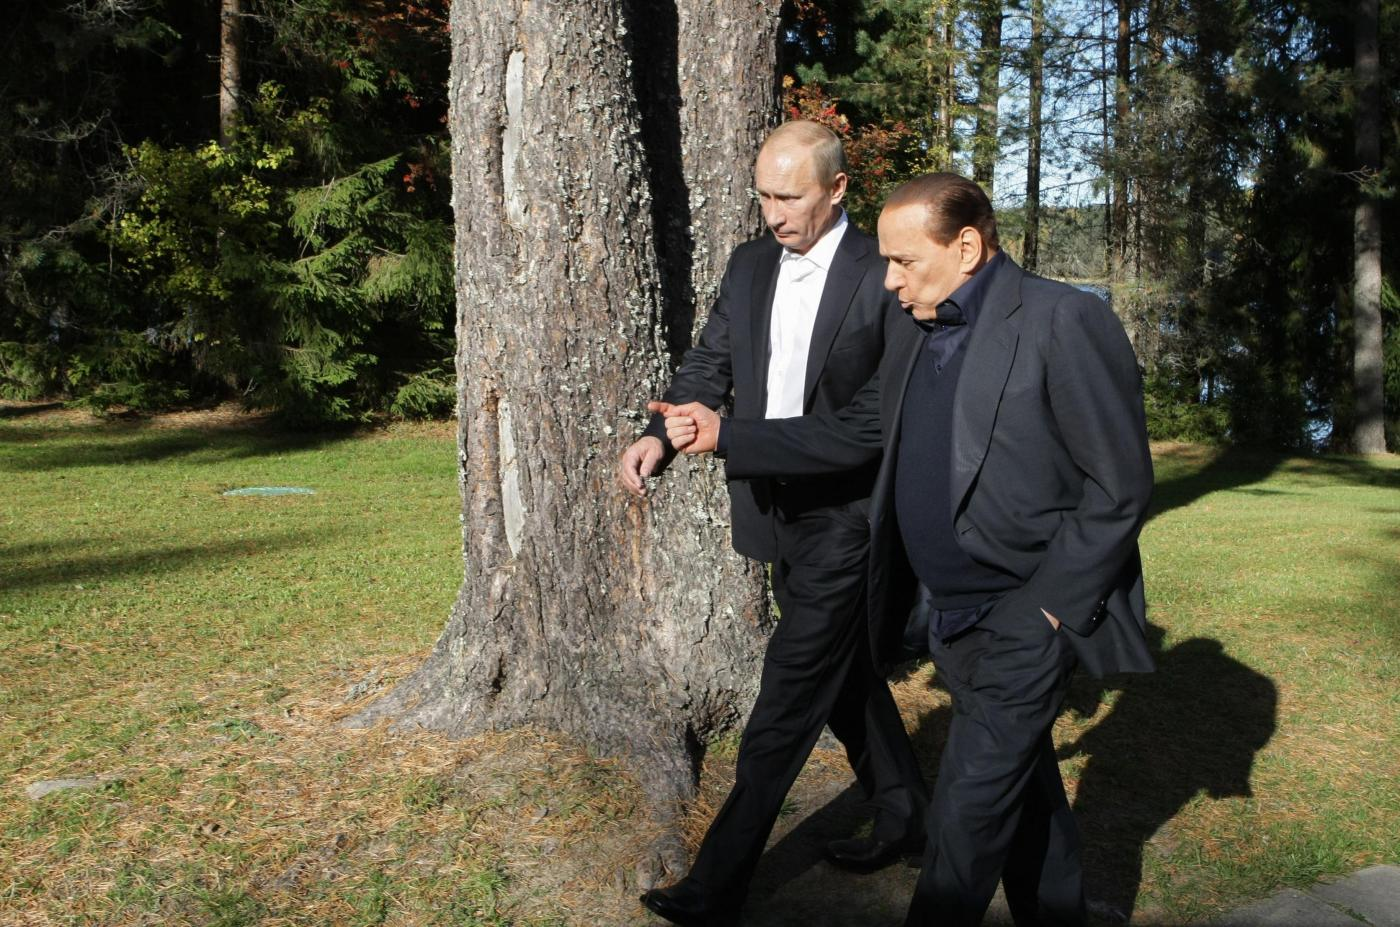 Silvio Berlusconi questa sera incontrerà Vladimir Putin